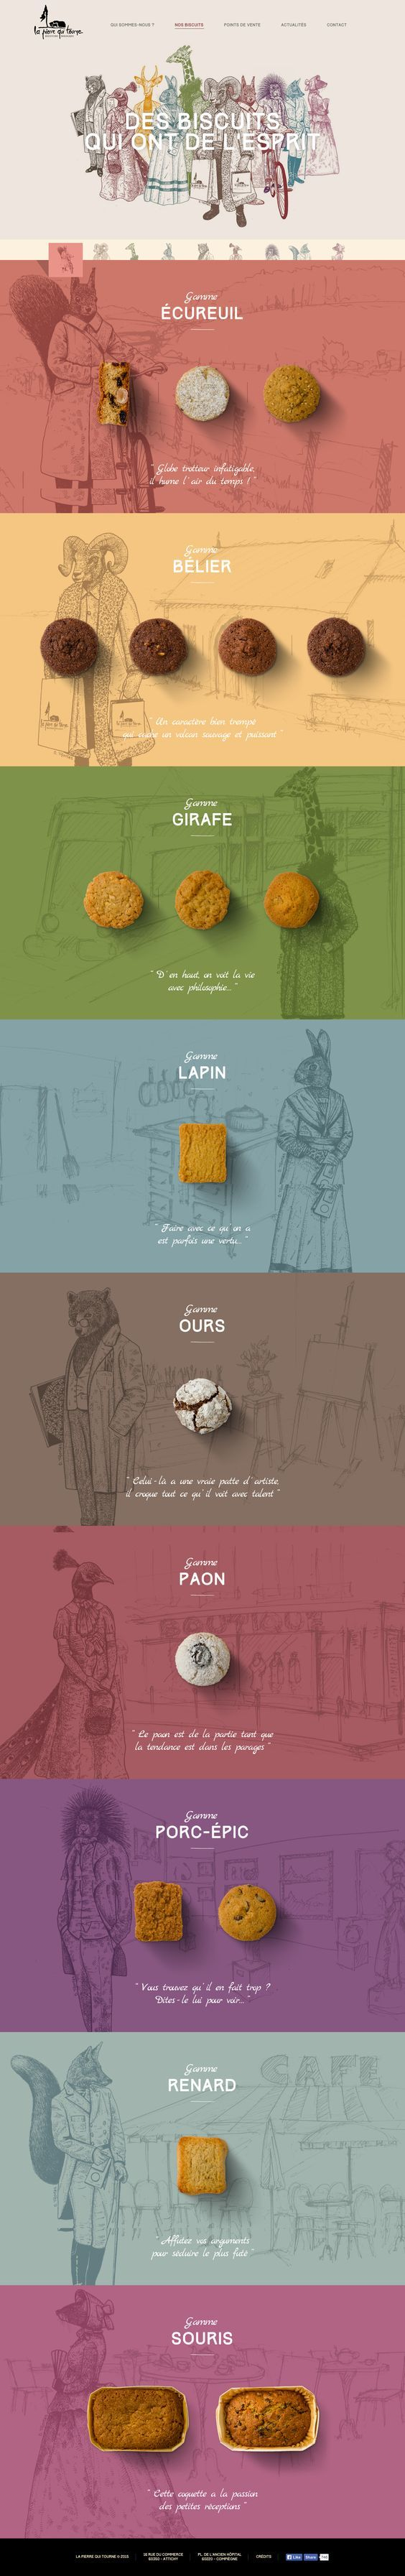 La Pierre Qui Tourne. French cookies. (More design inspiration www.aldenchong.com):